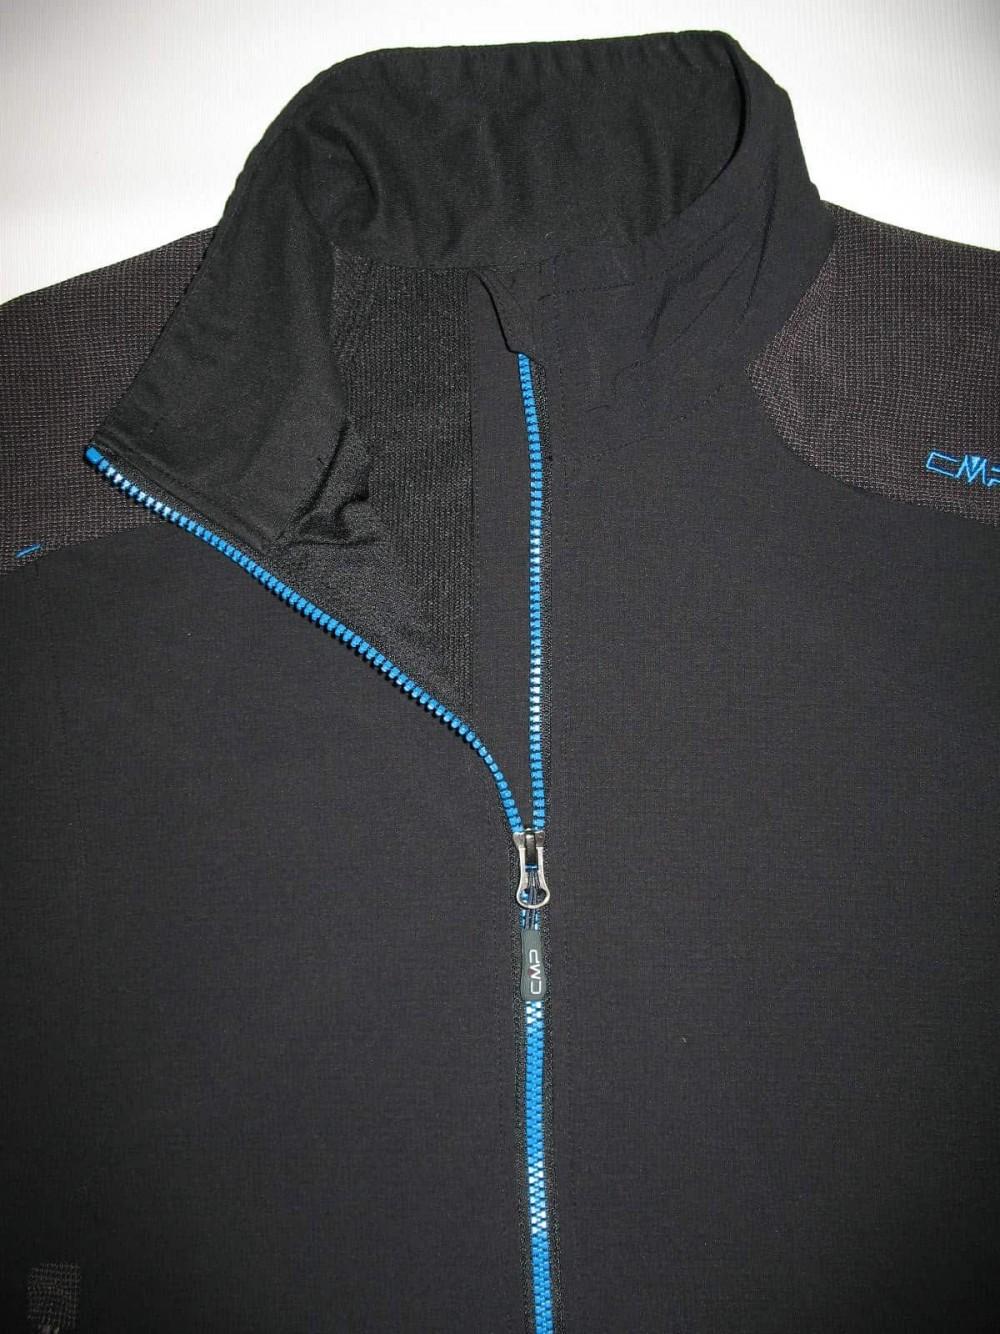 Куртка CMP extreme performance softshell jacket (размер L) - 2